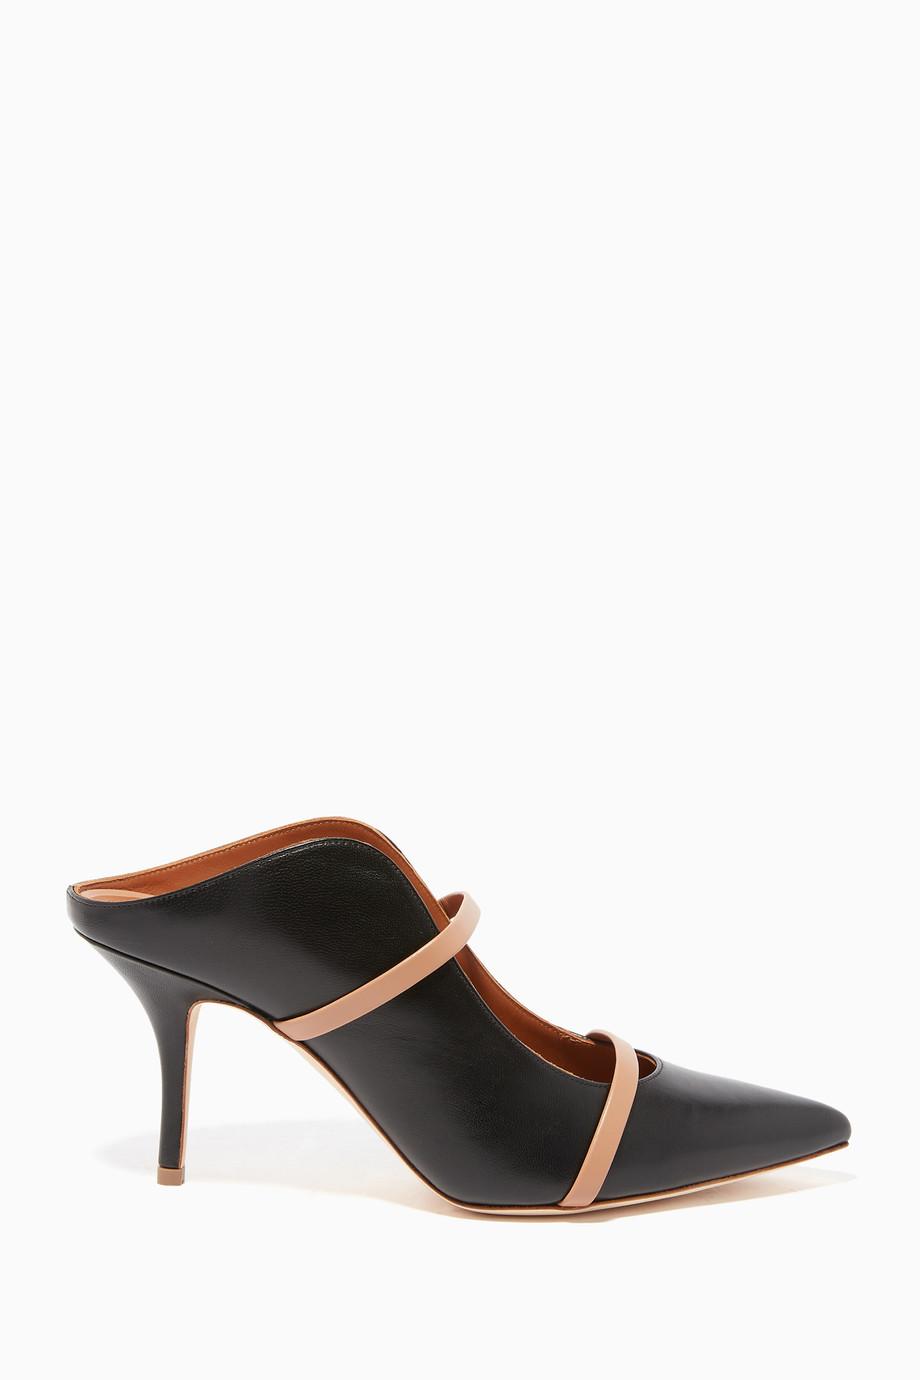 31d38b785f Shop Malone Souliers Black Black Maureen Nappa Mules for Women | Ounass